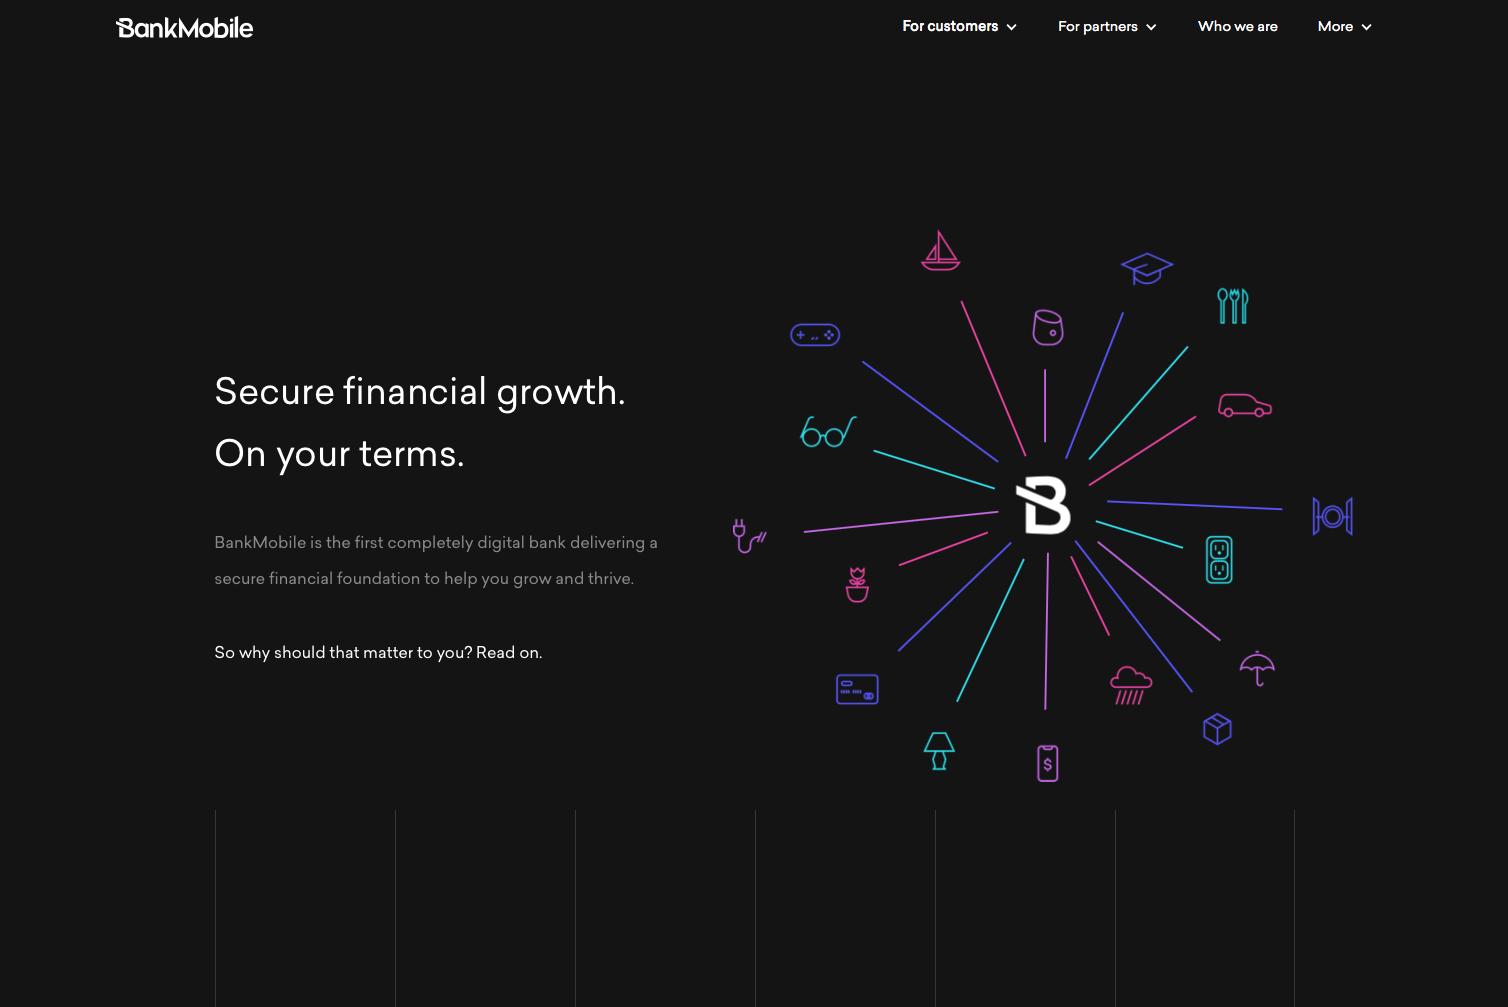 BankMobile Corporate Website